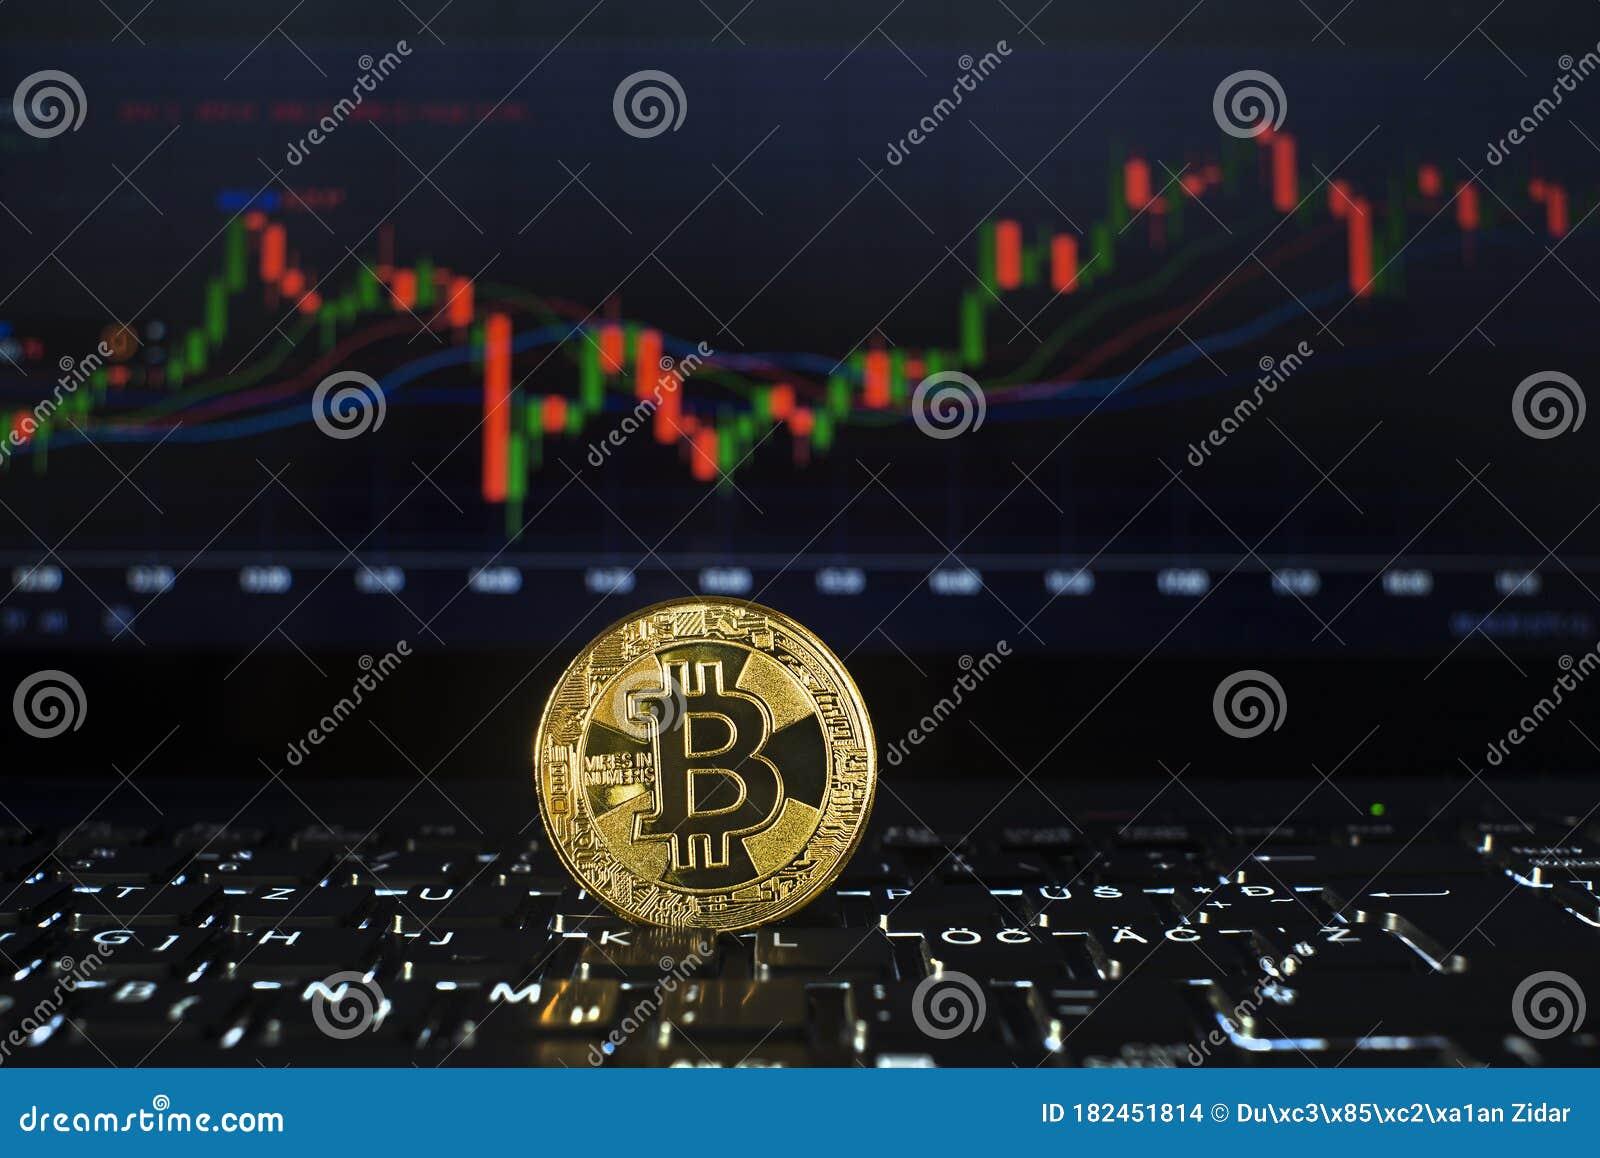 0 0004 btc ethereum bitcoin chart